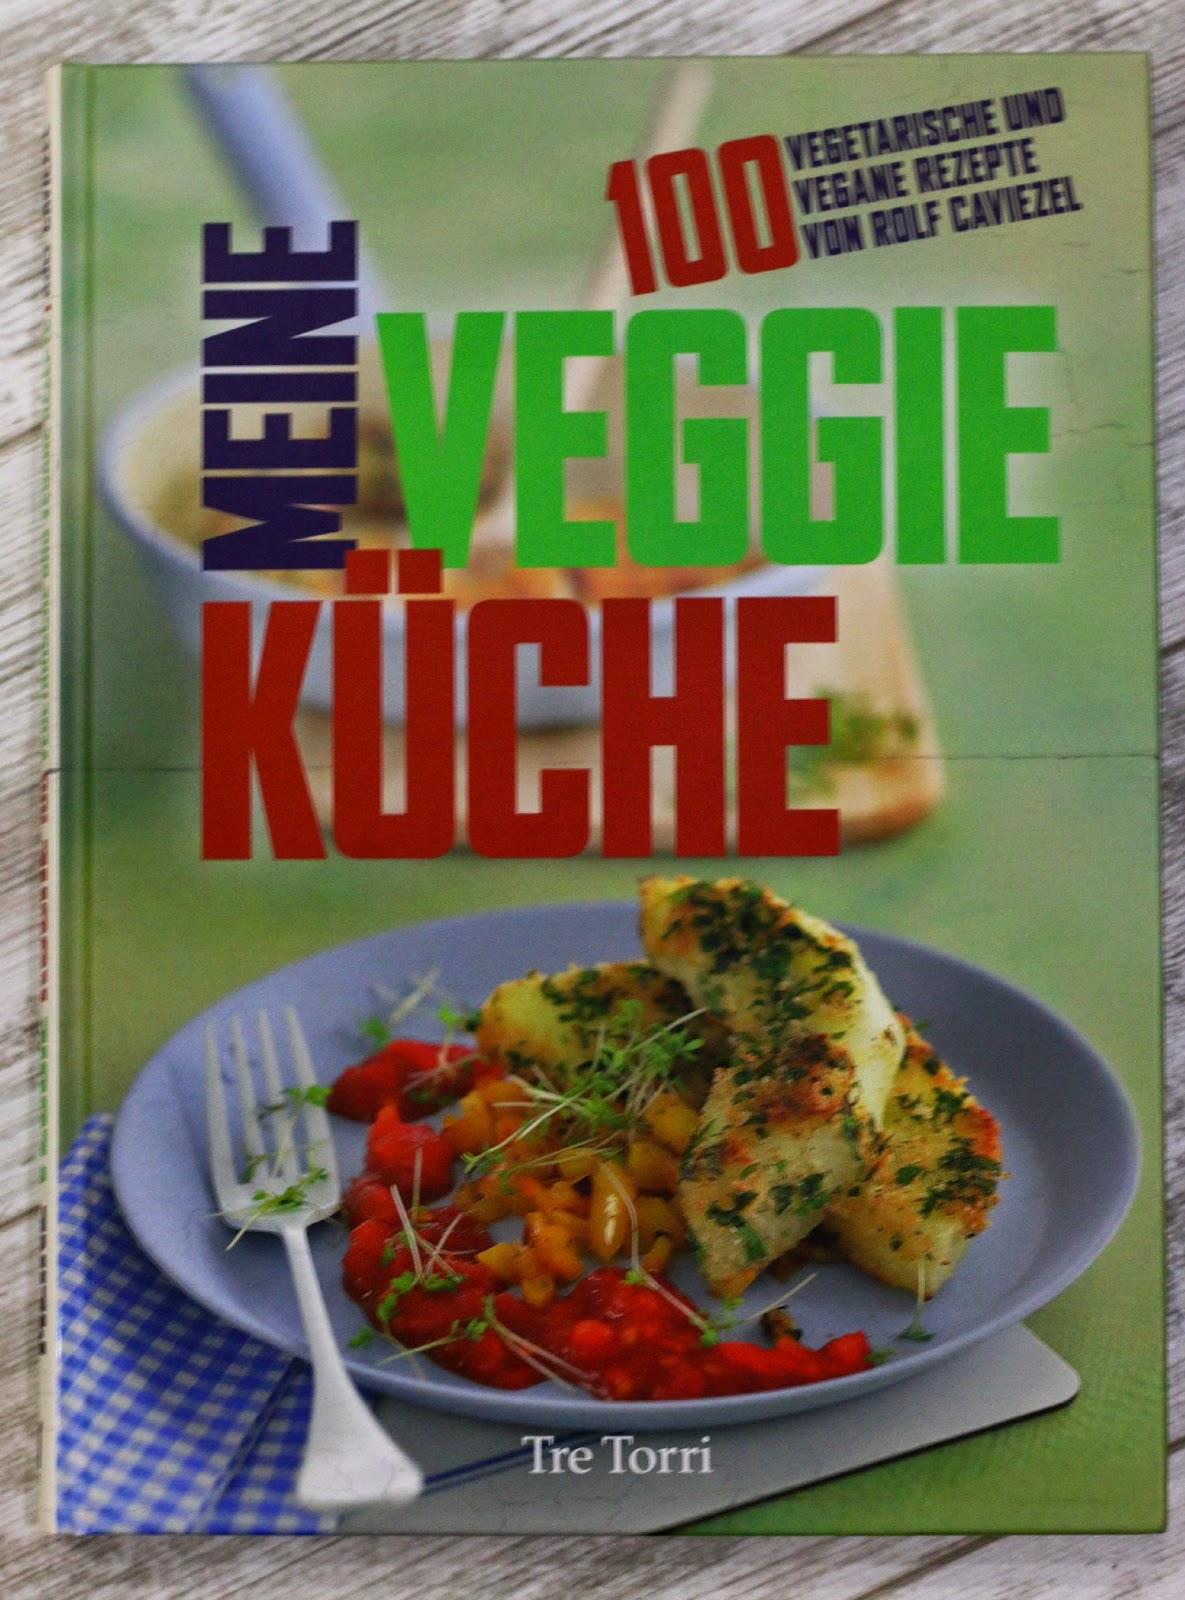 Rolf Caviezel, Rezension, Veggie, Vegetarisch, Vegan, Kochbuch, Tre Torri Verlag